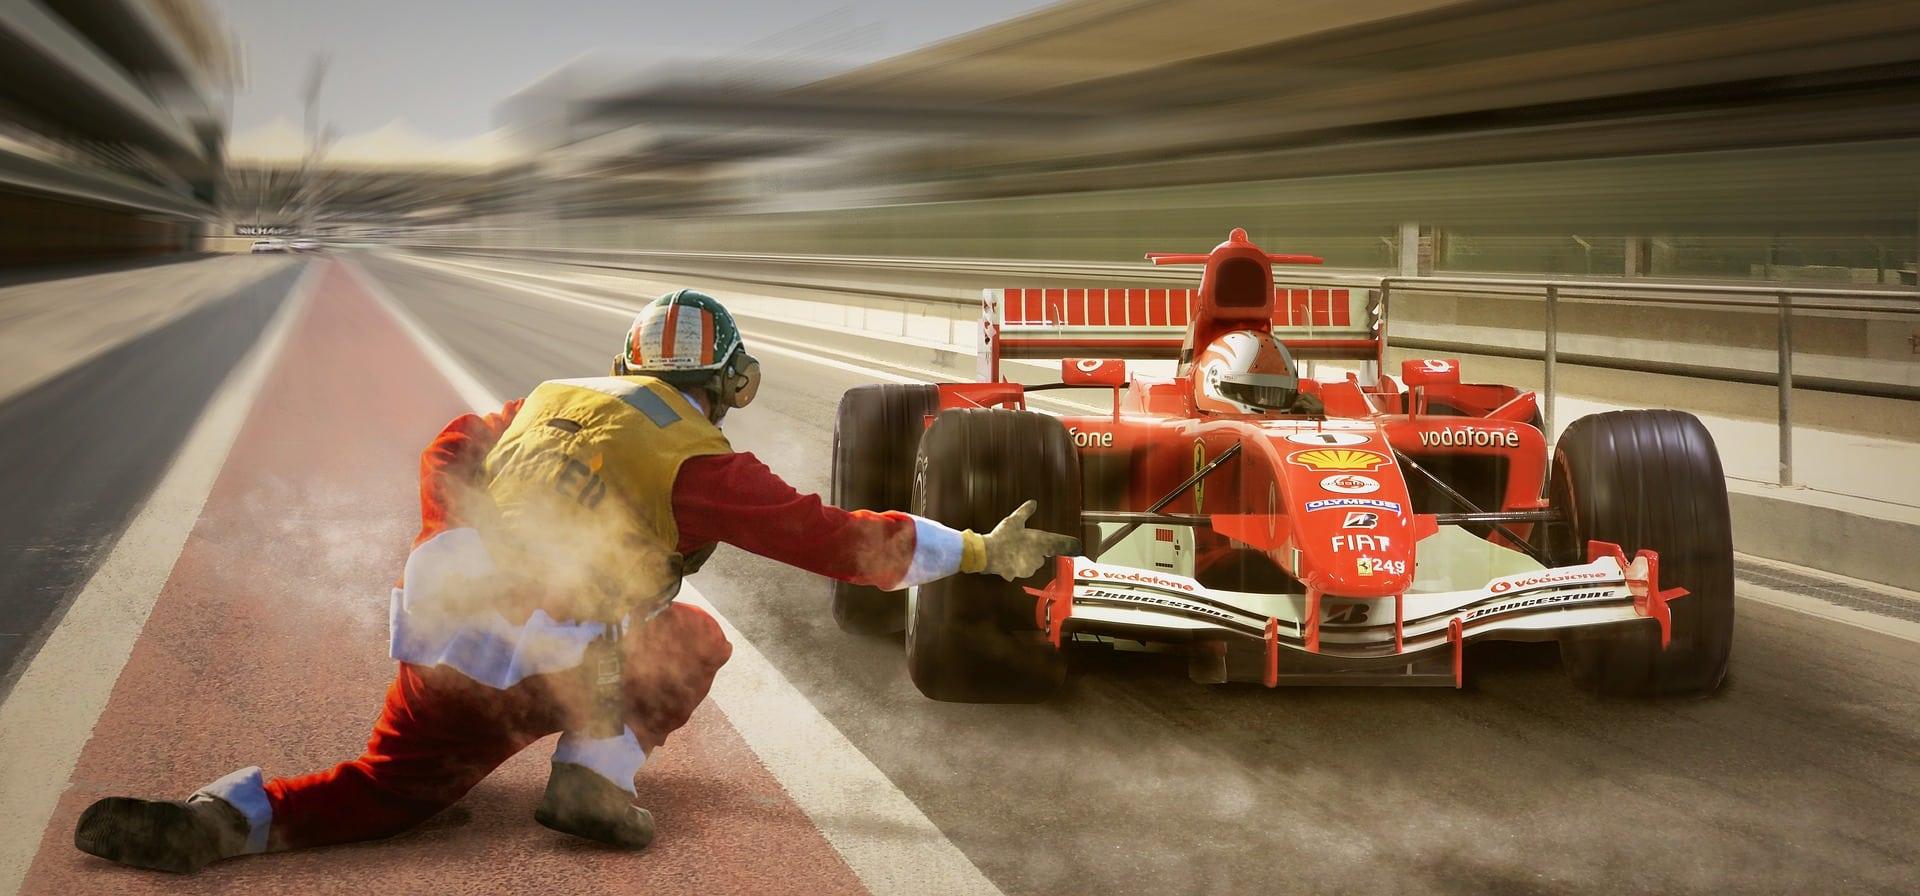 racing online during coronavirus lockdown